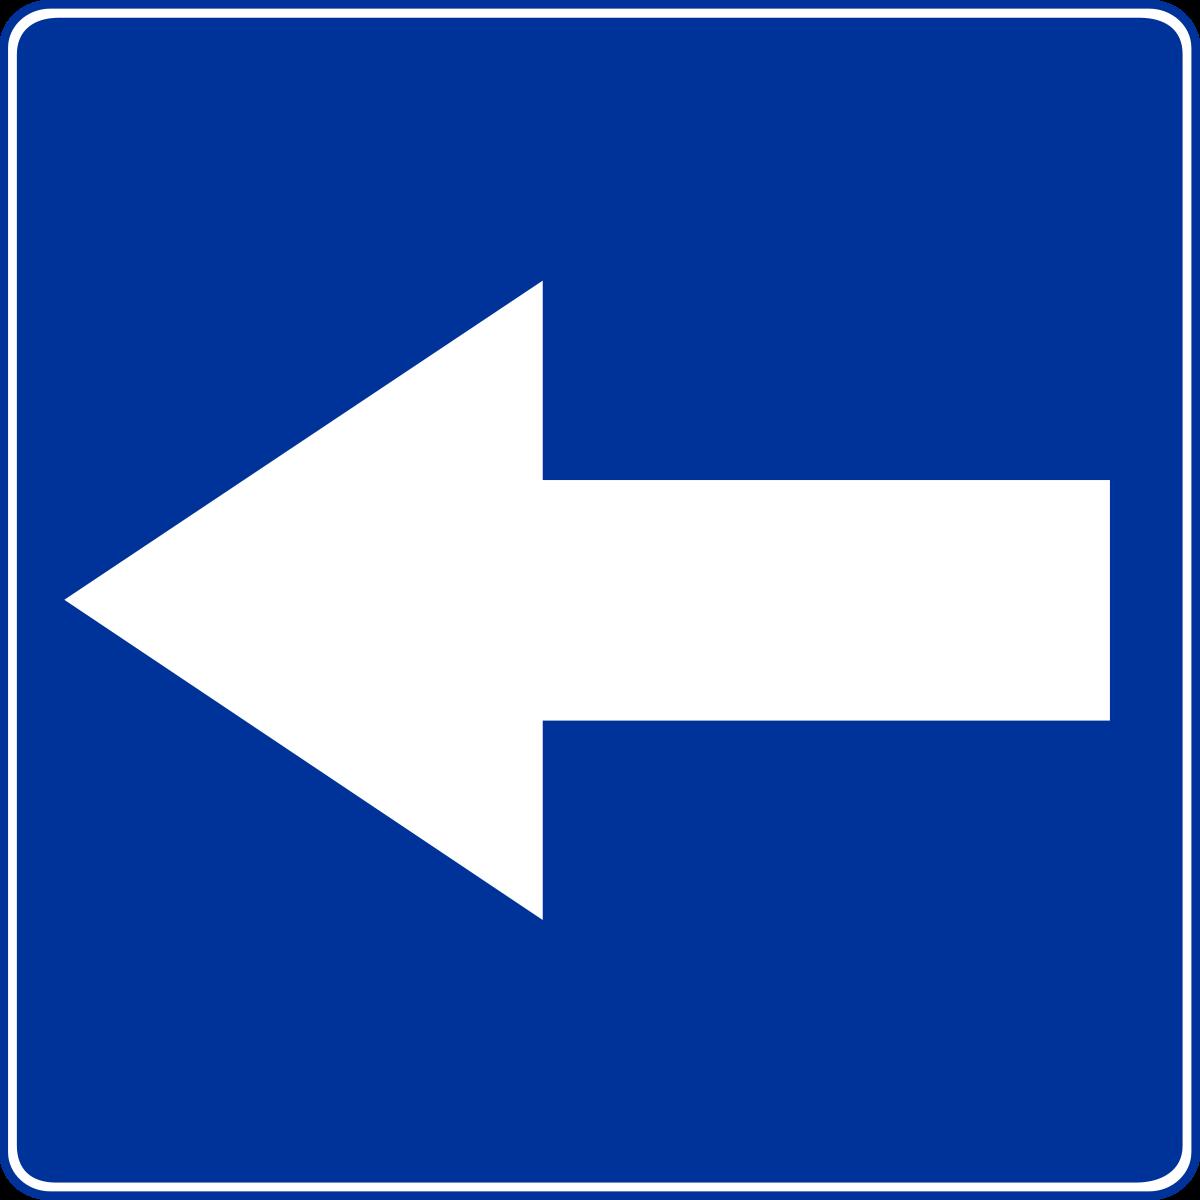 PFEIL 2 - nach links.png